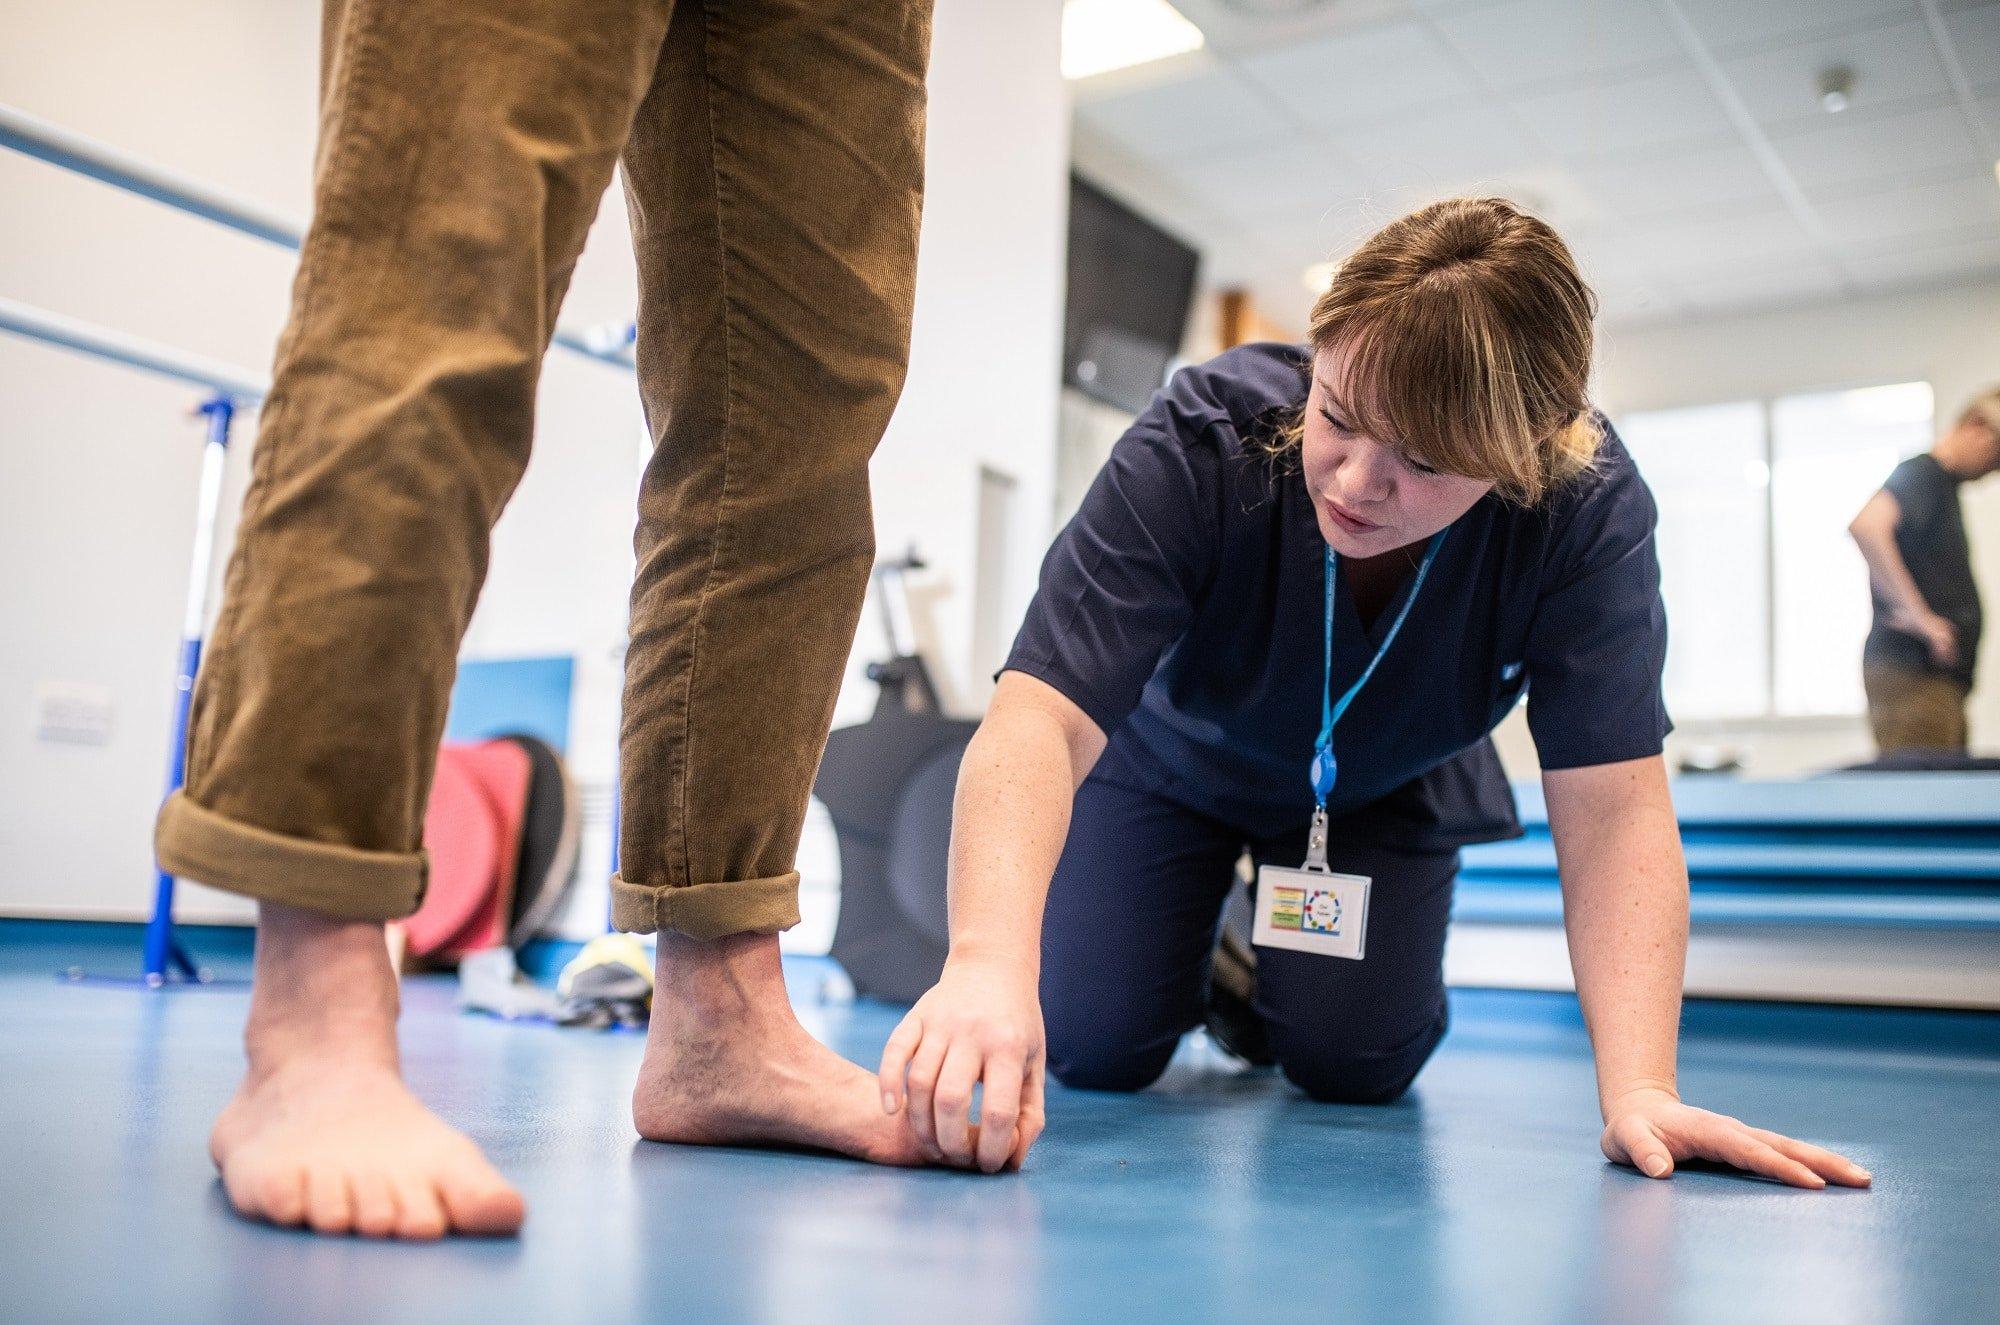 Podiatrist checking patients feet